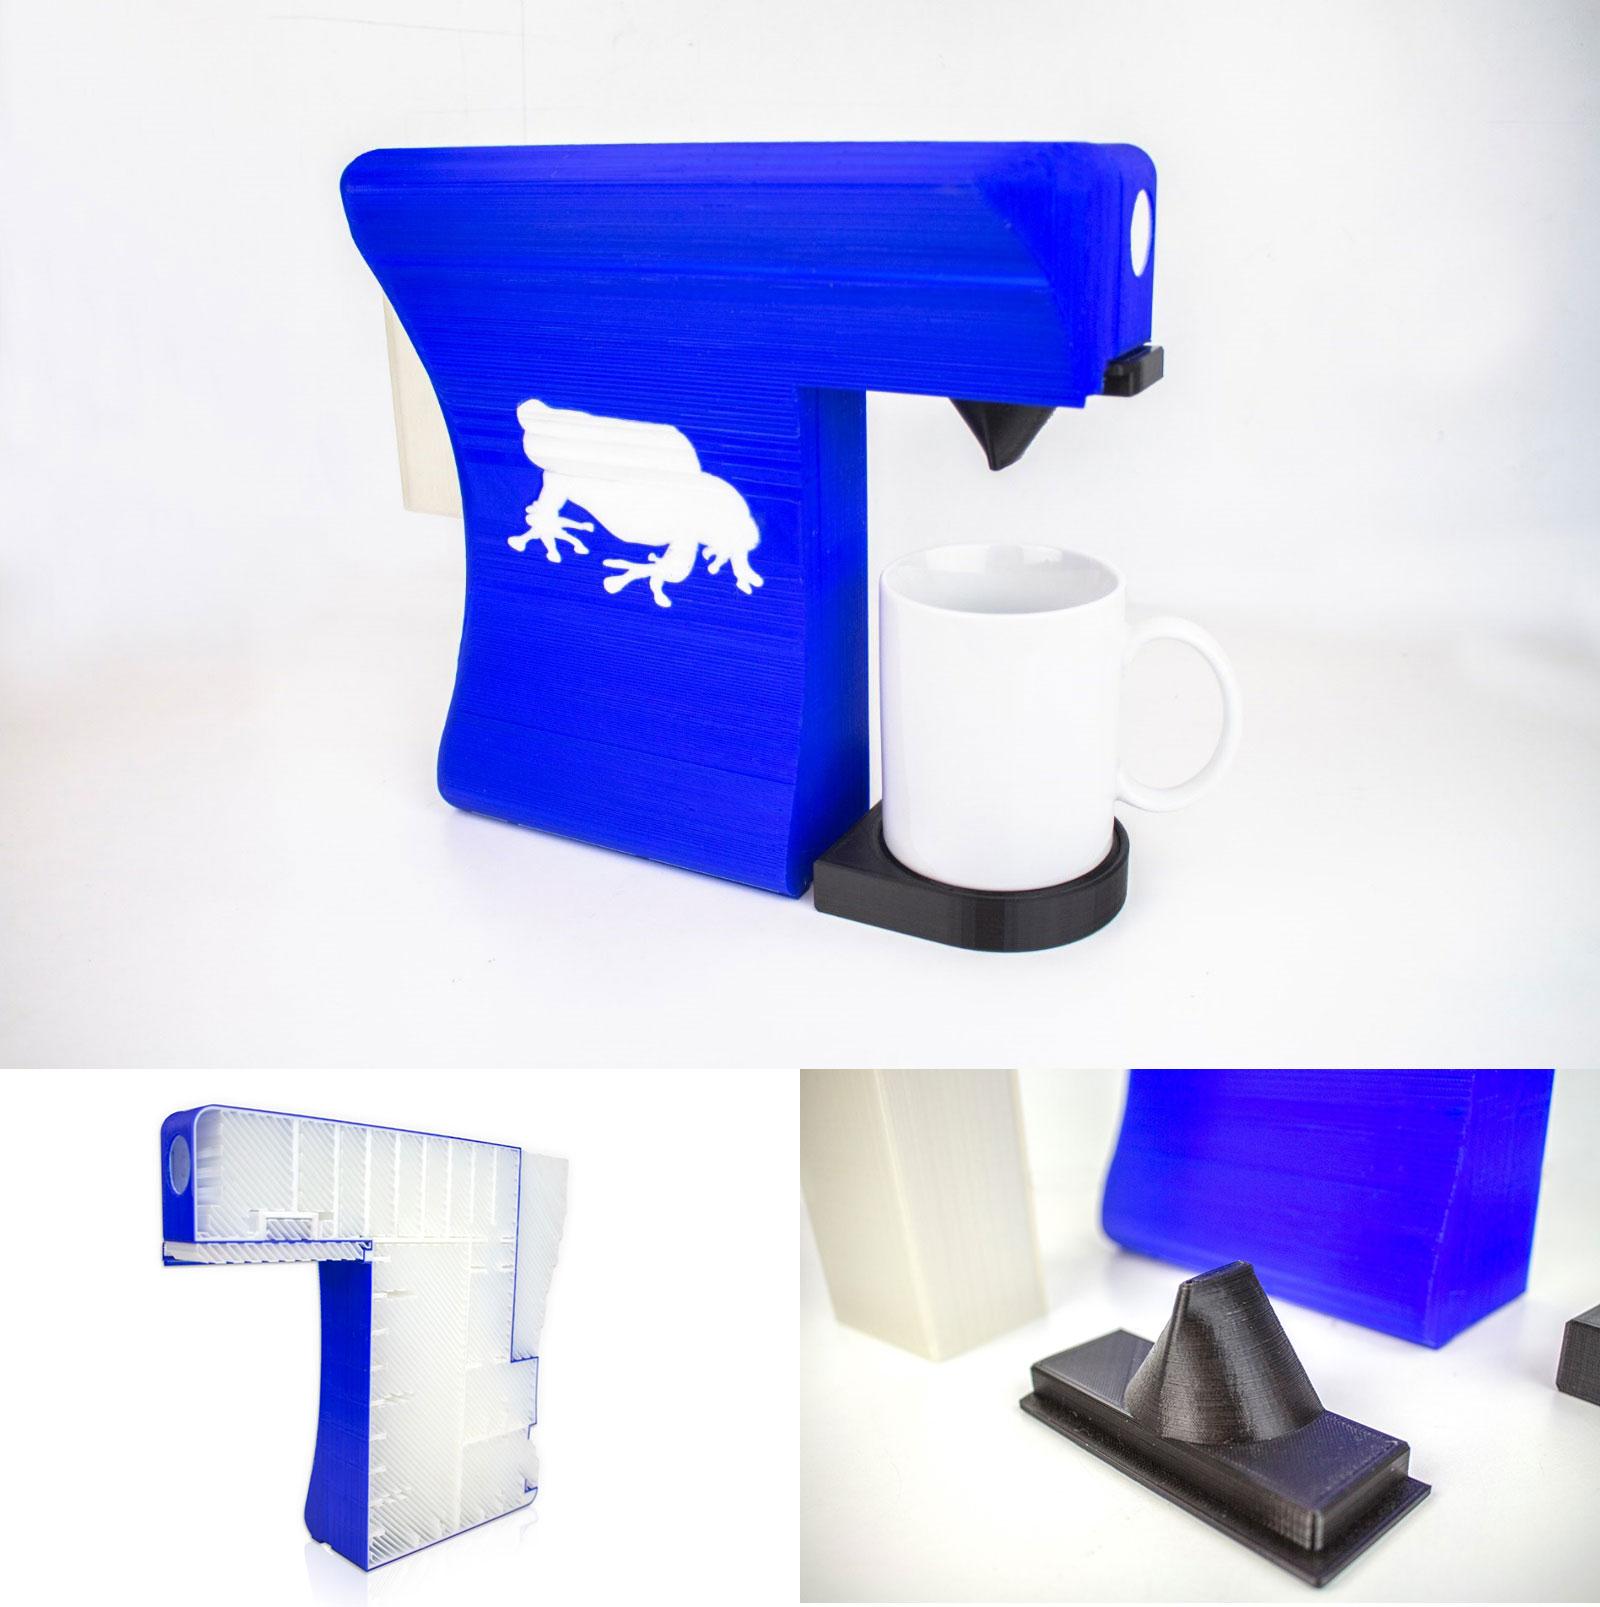 Dual Color Print Leapfrog Bolt